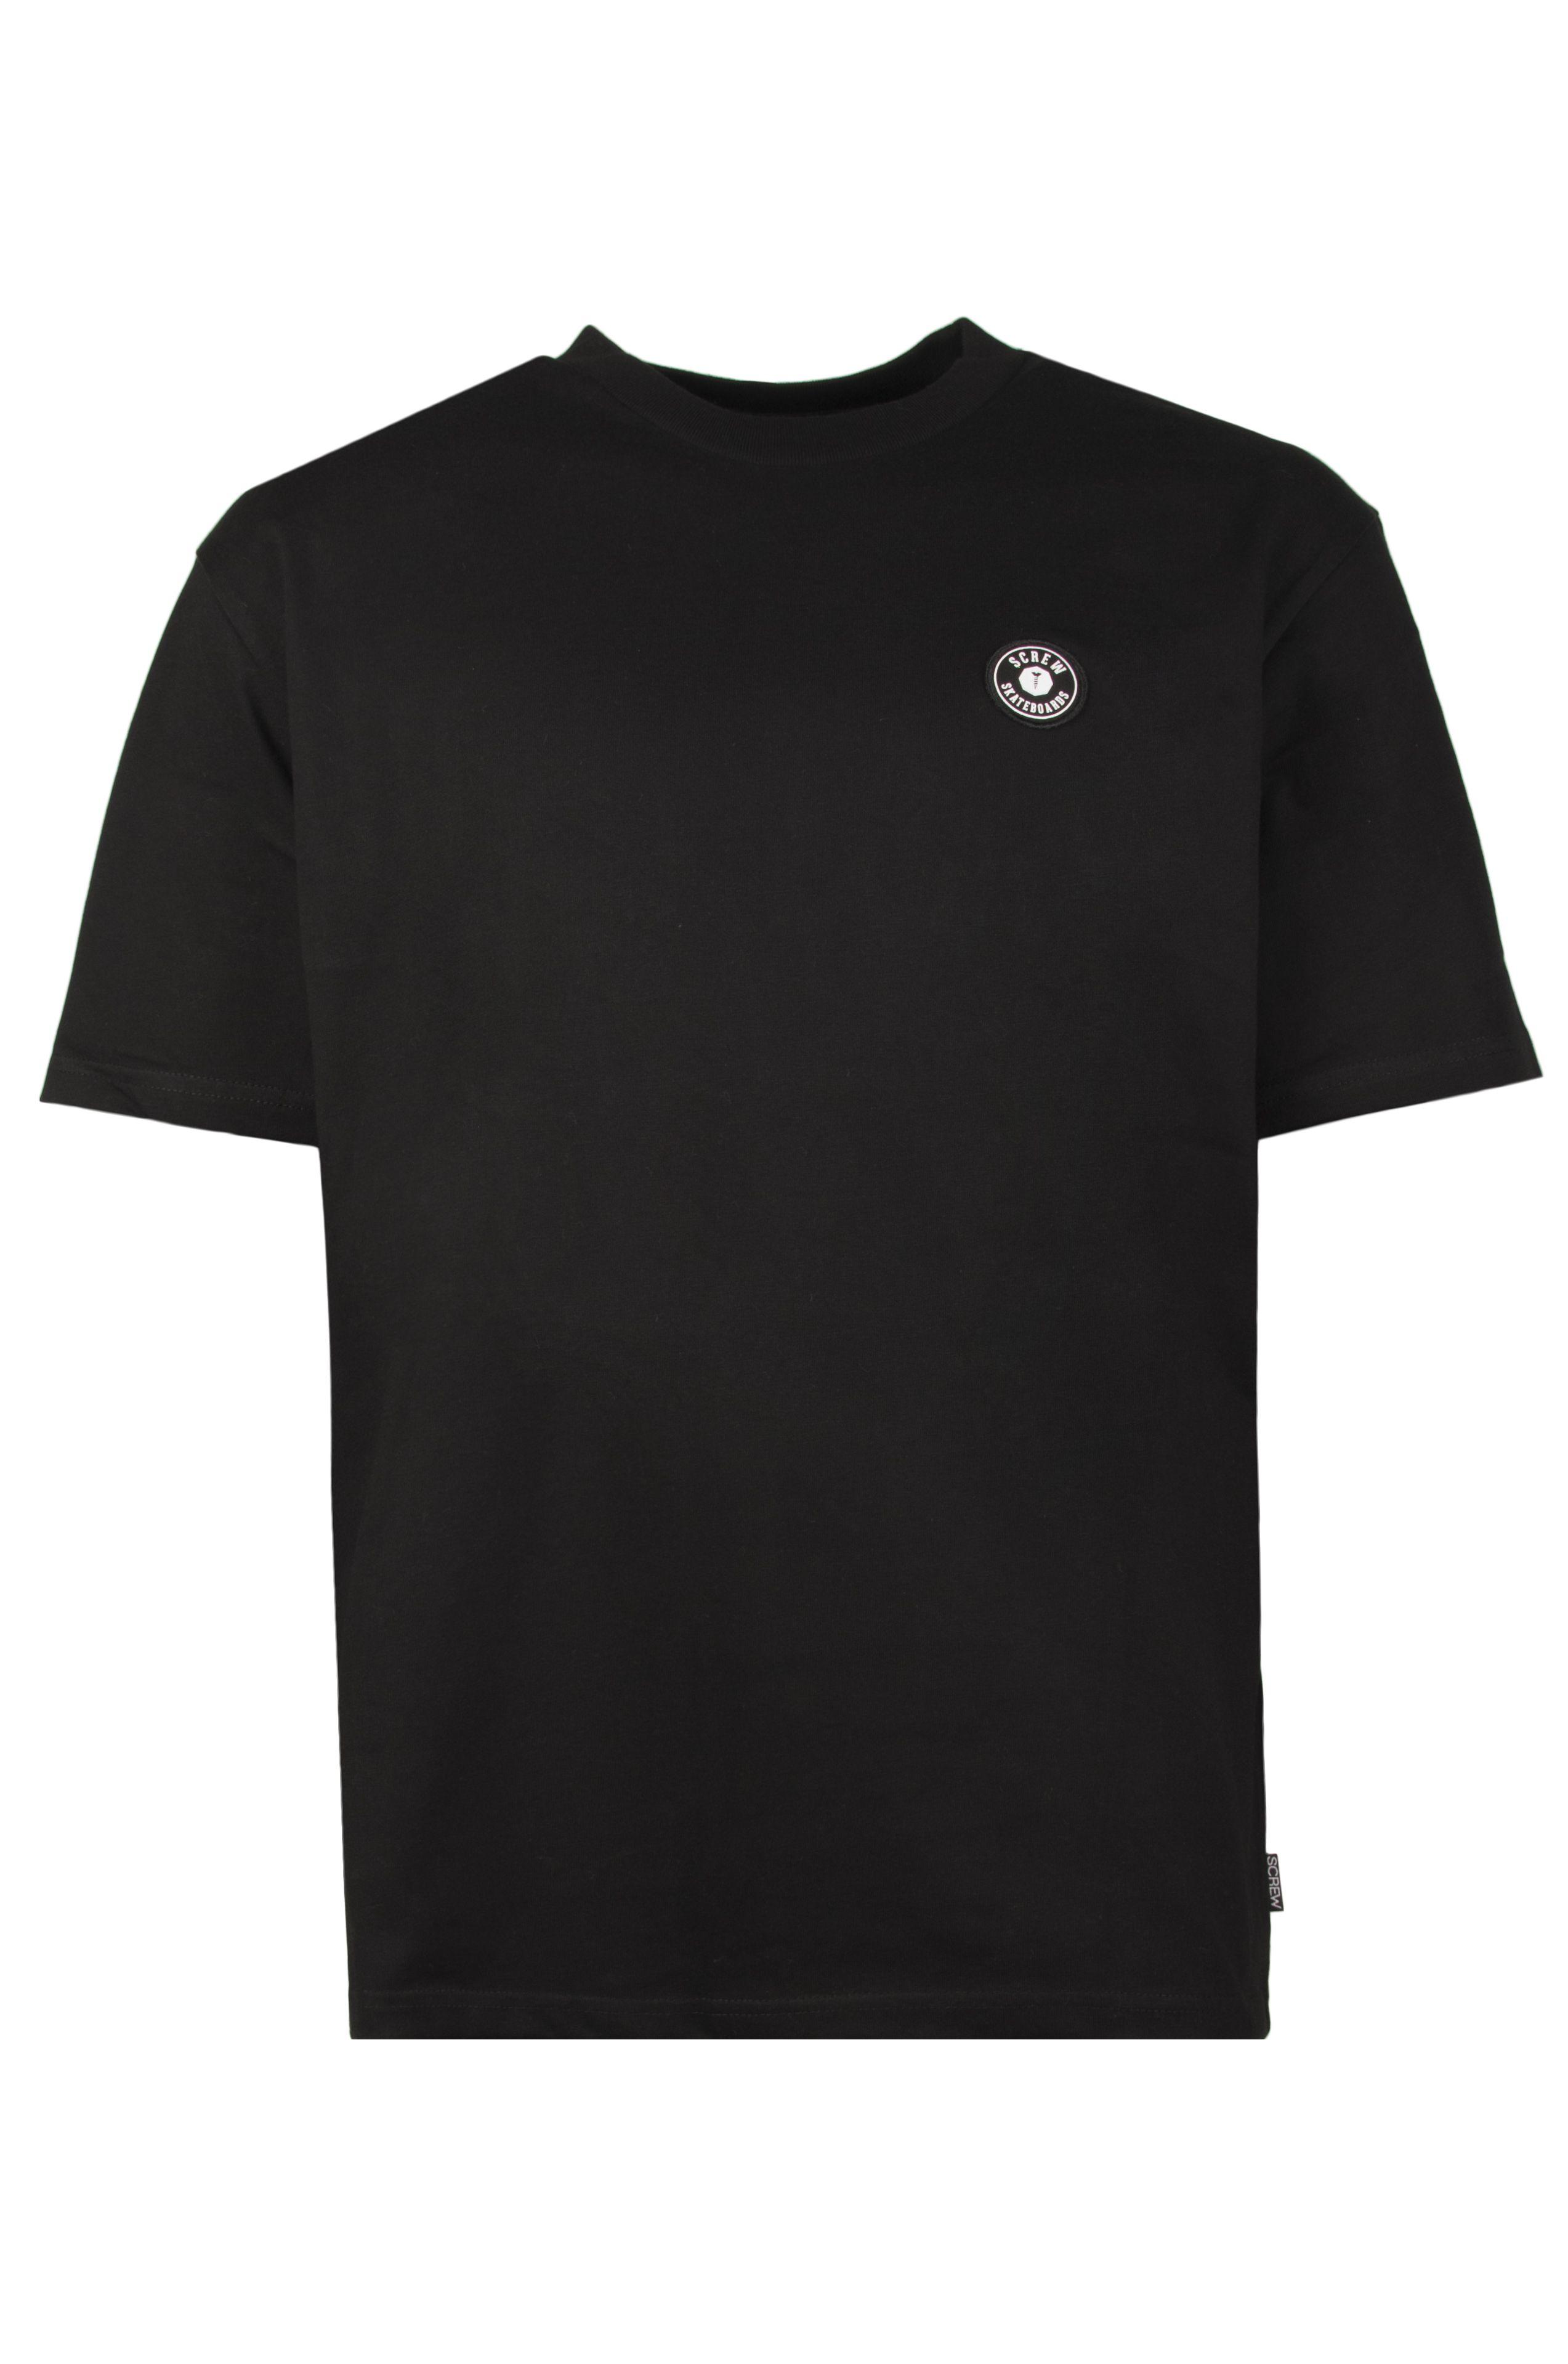 Screw T-Shirt SHOUT KONG Black